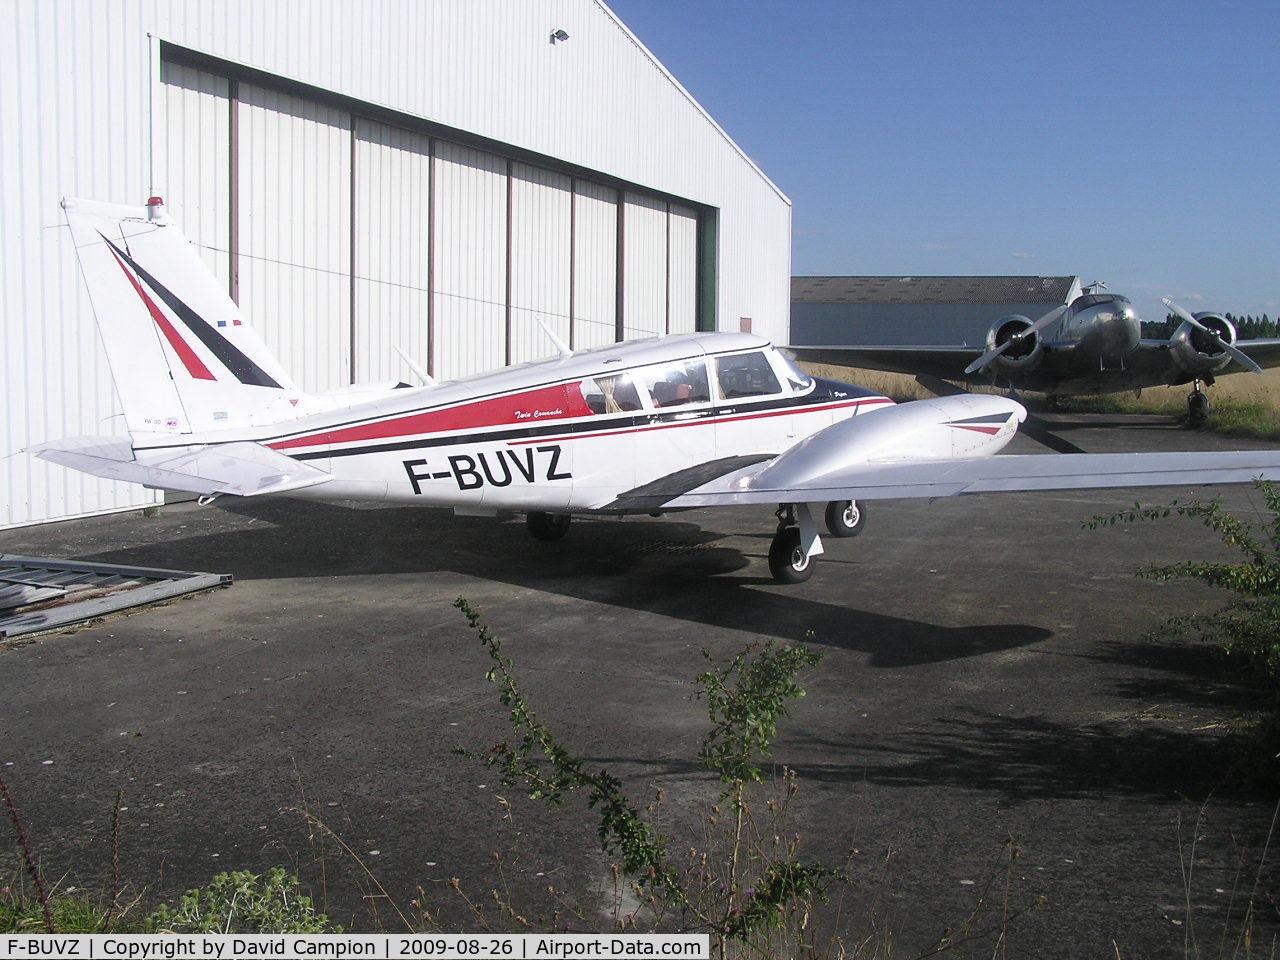 F-BUVZ, Piper PA-30-160 Twin Comanche B C/N 301379, Lognes, France